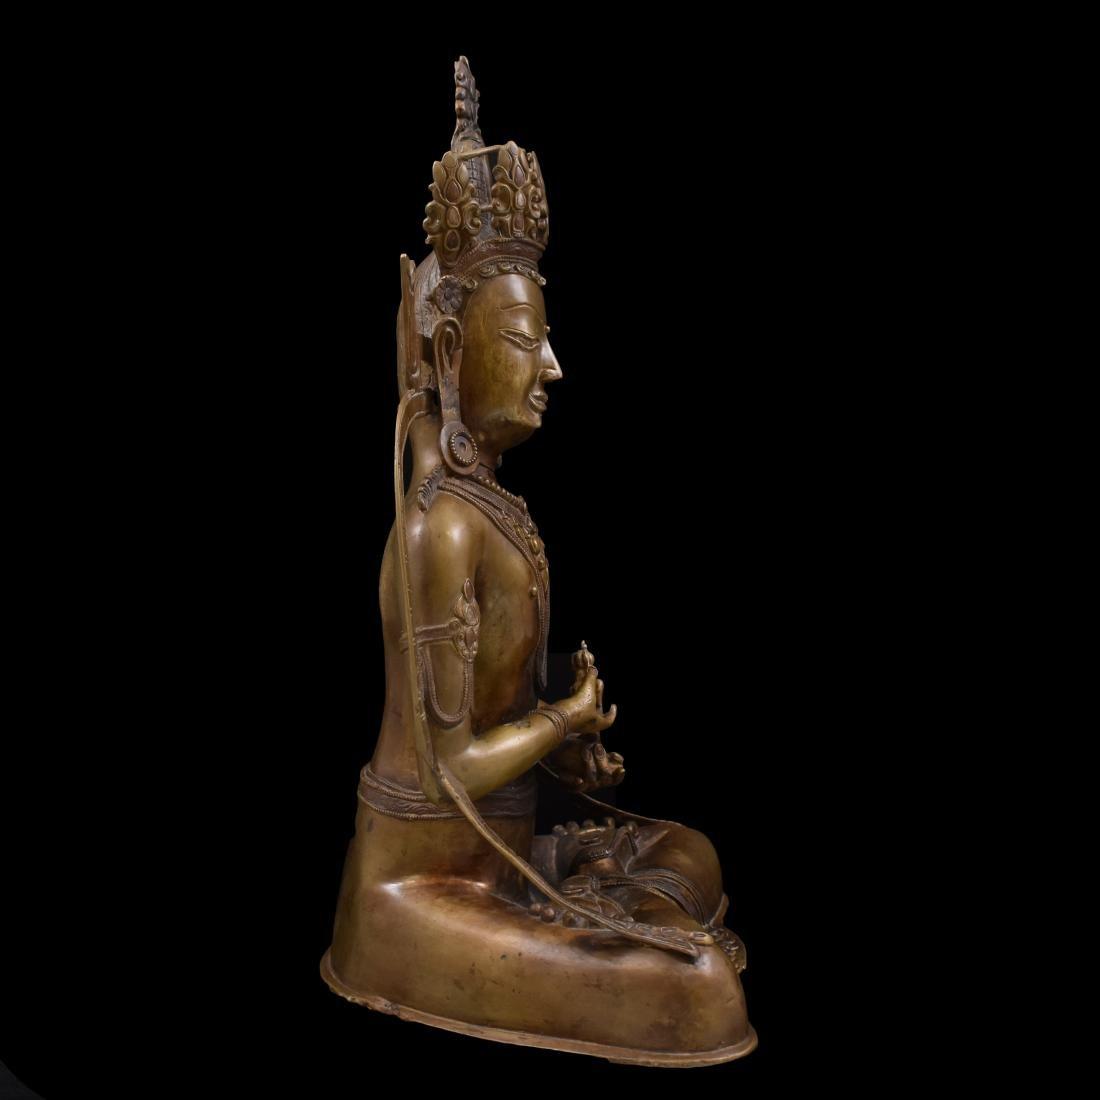 LARGE QING BRONZE BUDDHA FIGURE OF VAJRADHARA - 12